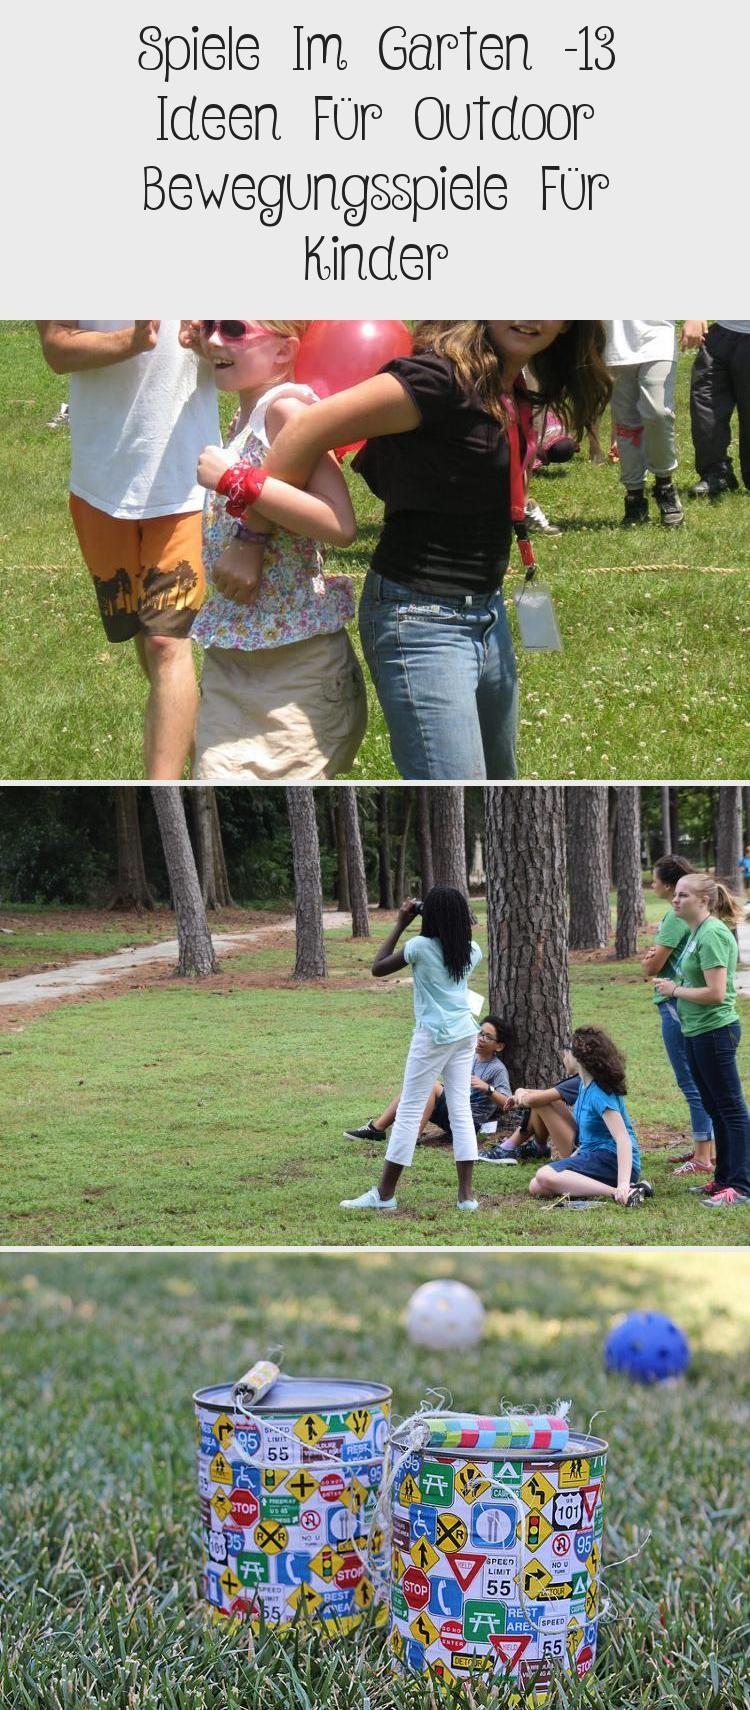 Spiele Im Garten 13 Ideen Fur Outdoor Bewegungsspiele Fur Kinder Outdoor Workouts Games For Kids Exercise